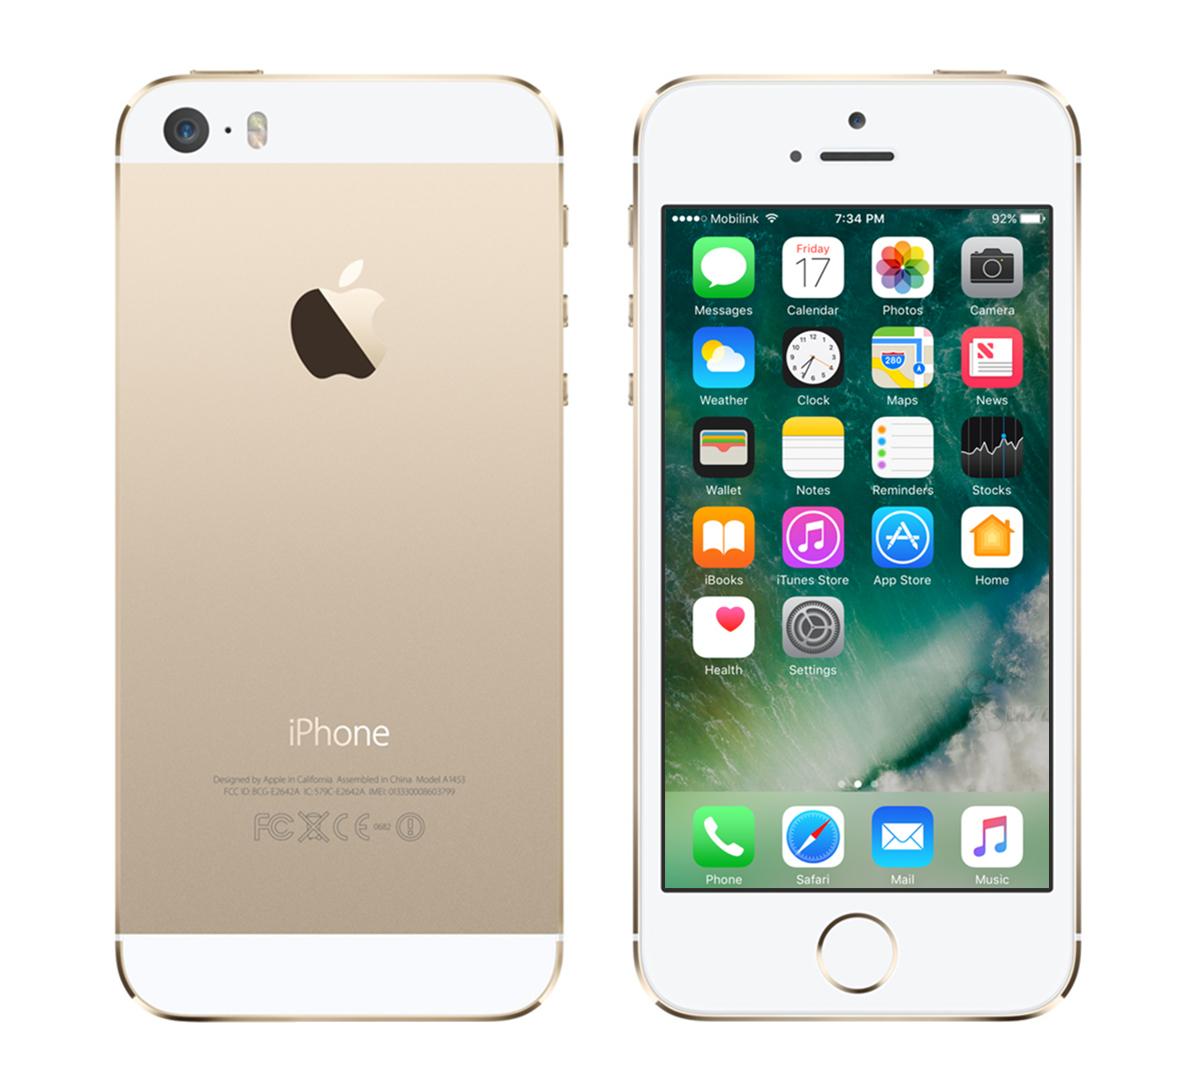 Dignitas Renewd Apple iPhone 5S aufgearbeitet - 32GB Gold